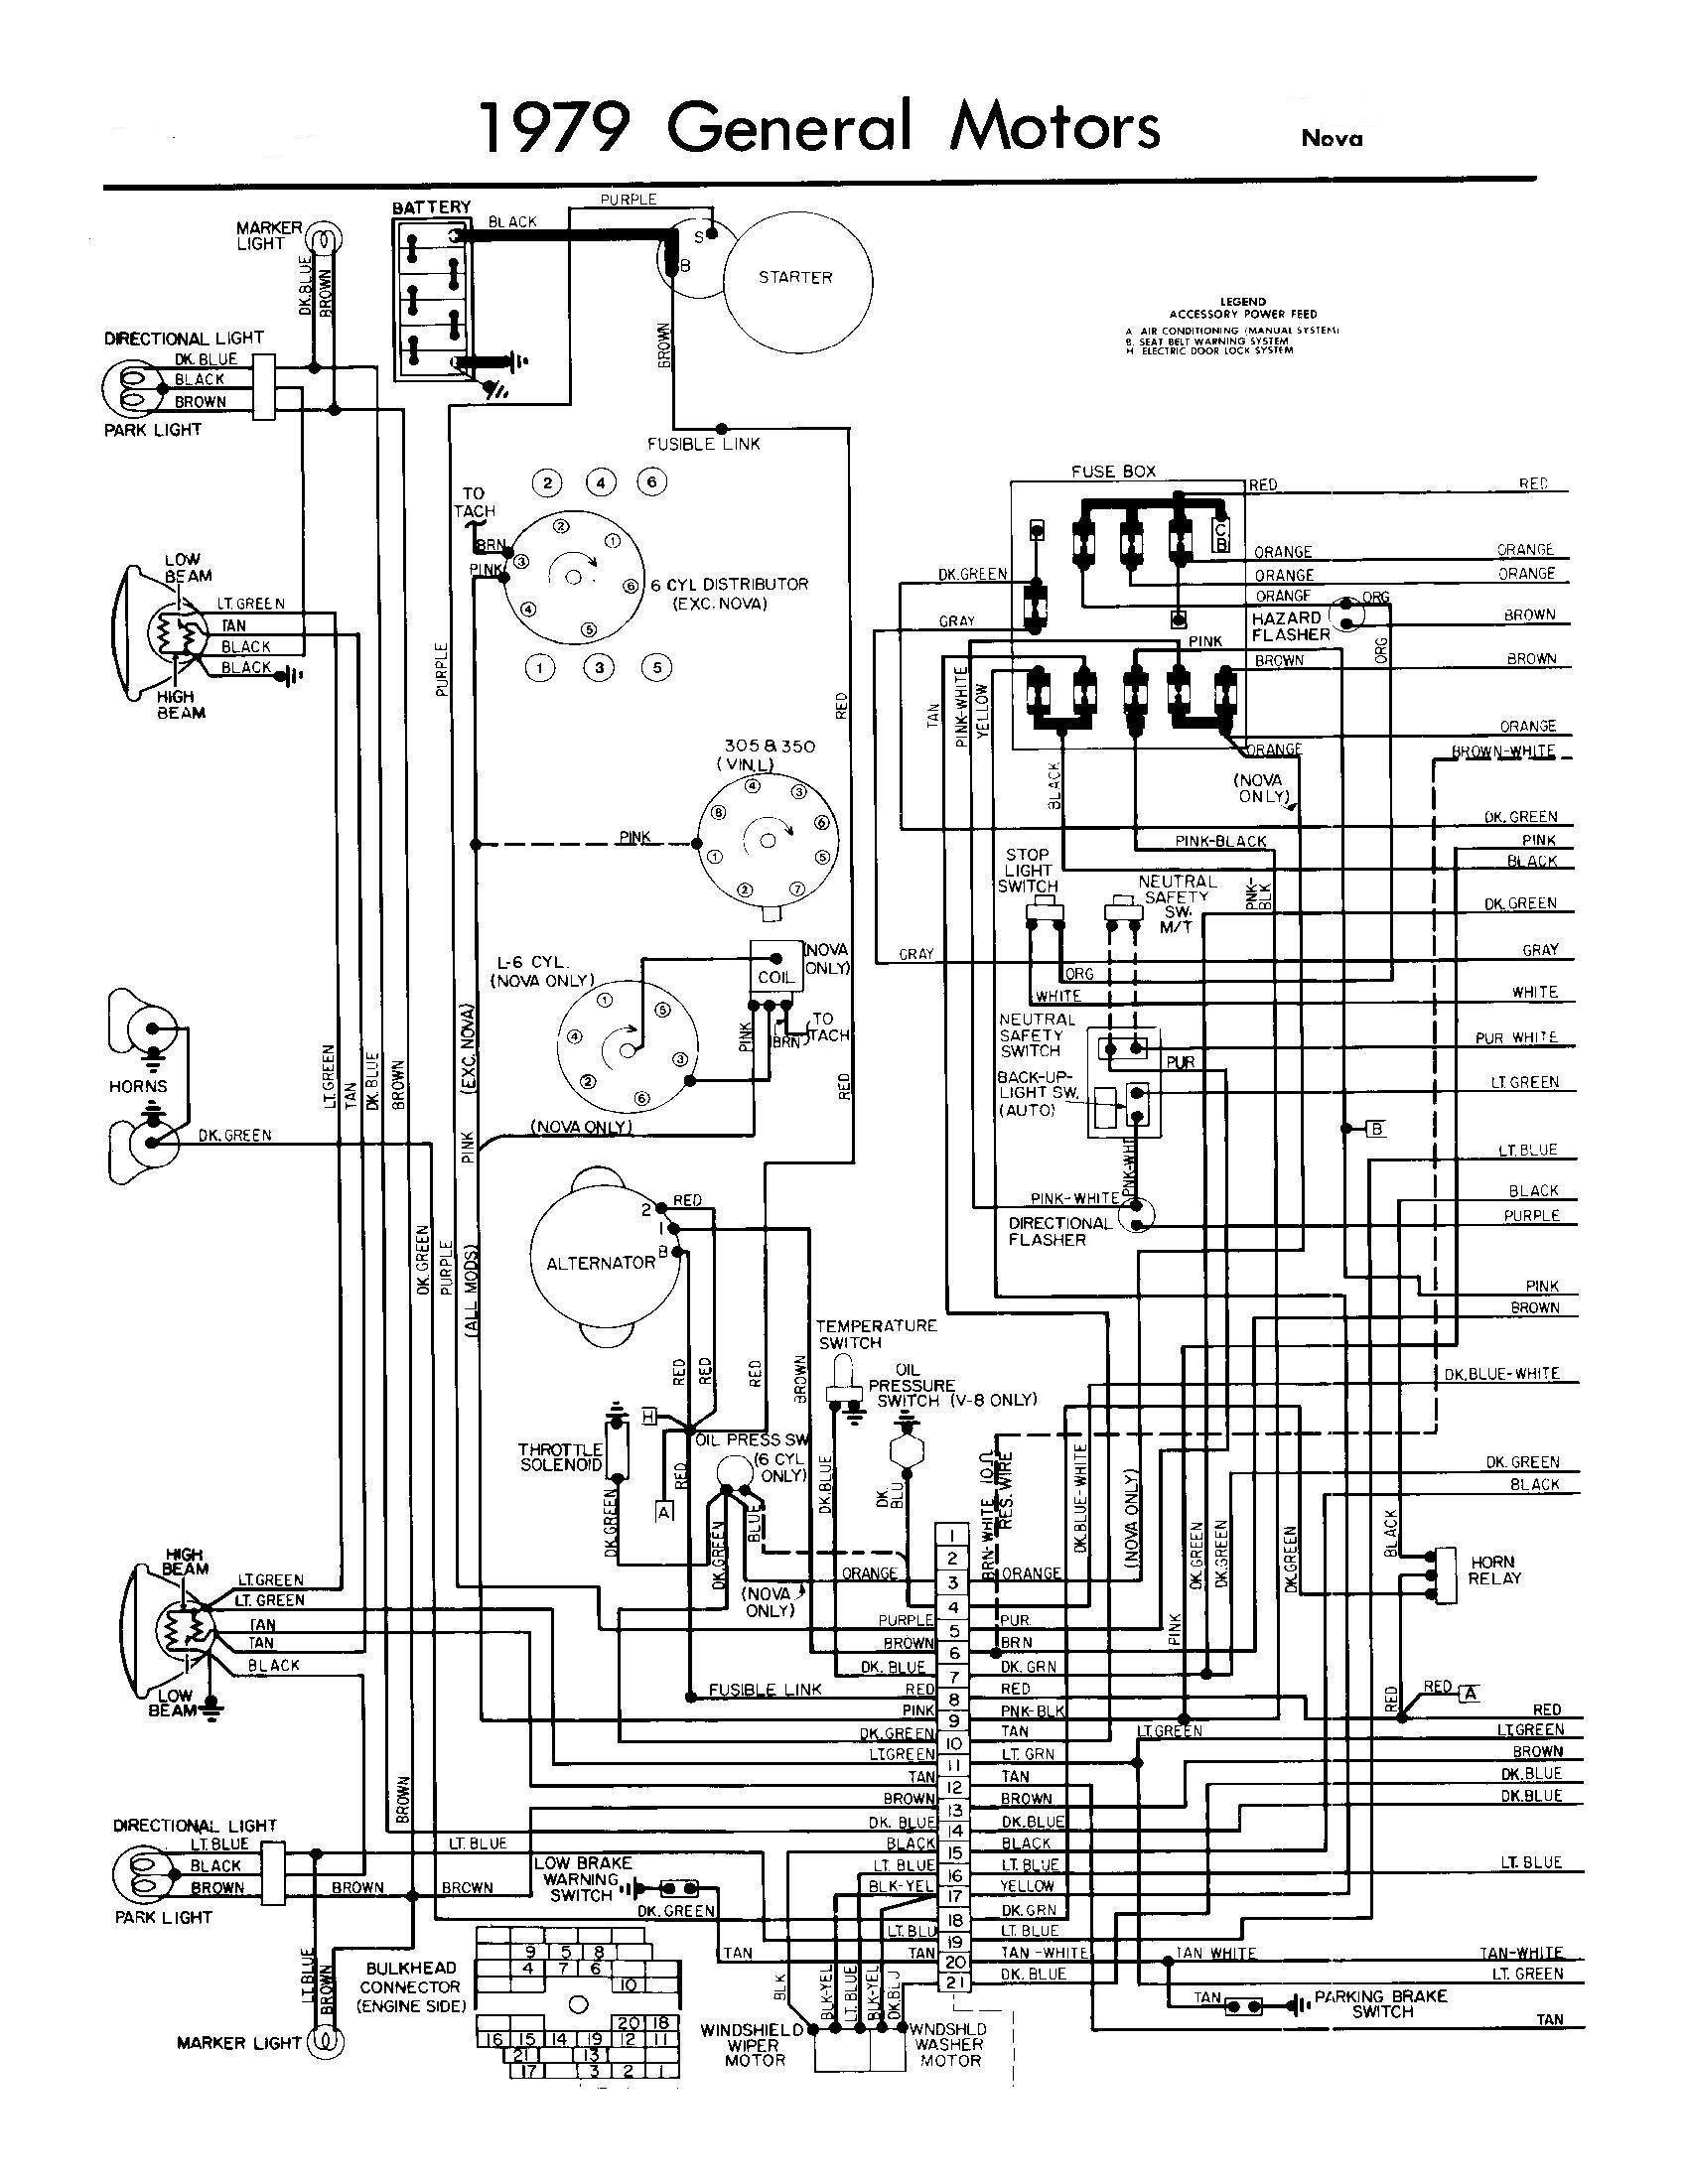 Chevy C10 Starter Wiring Diagram | Wiring Diagram - Sbc Starter Wiring Diagram